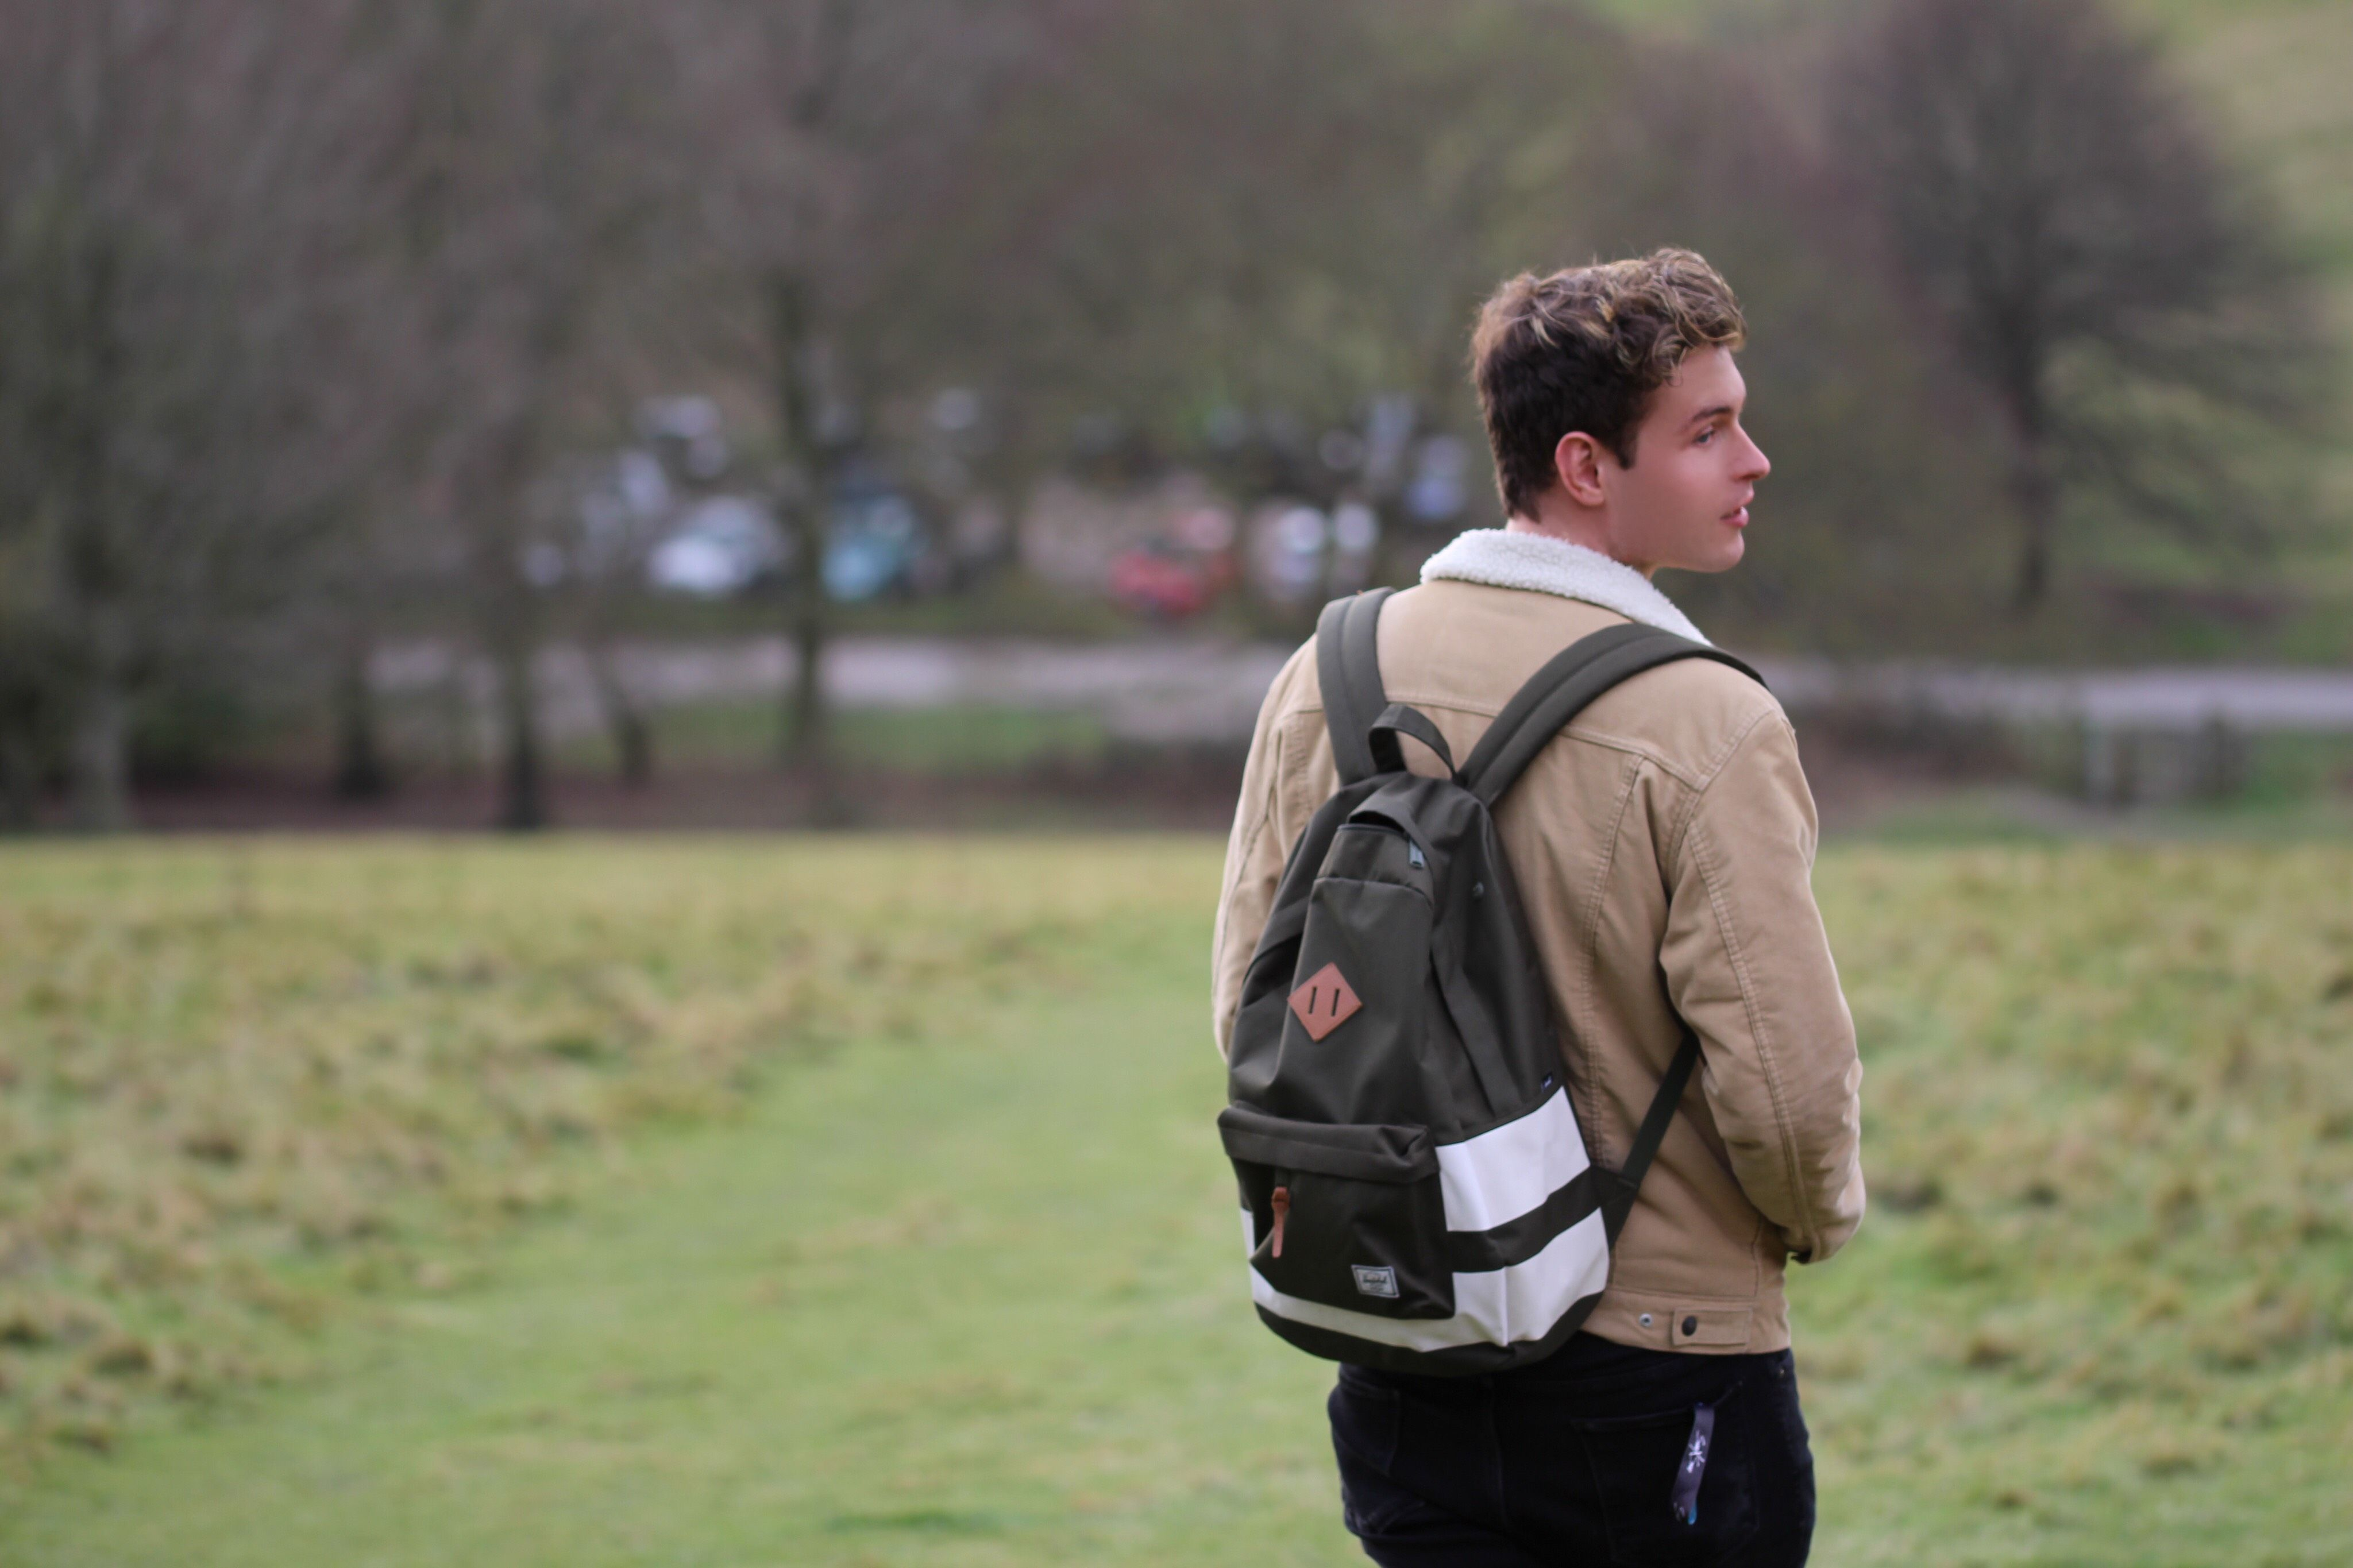 Image may contain: Backpack, Bag, Apparel, Clothing, Human, Person